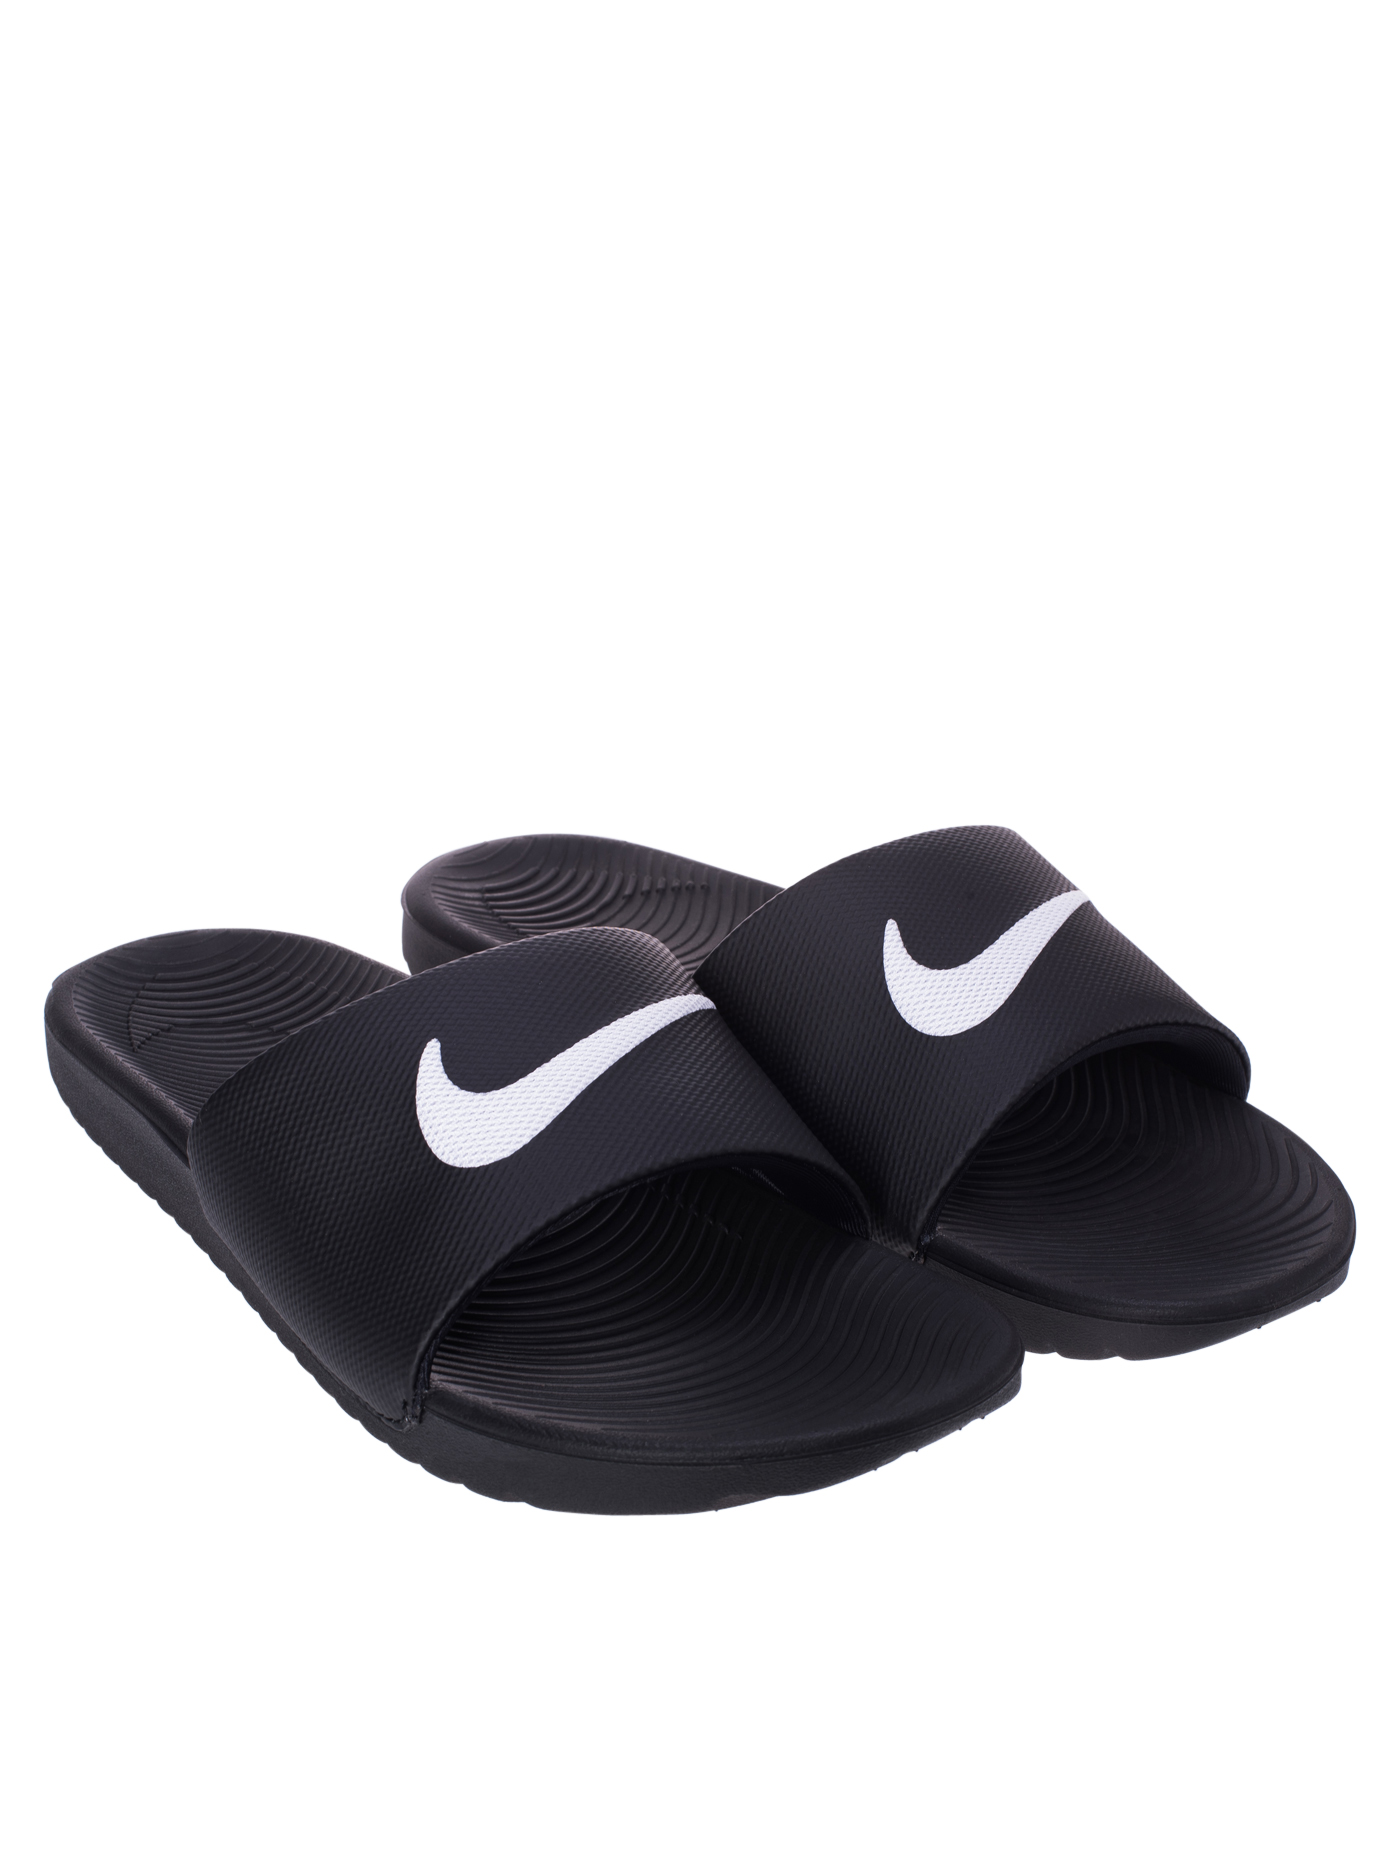 competitive price 1418f f0bd1 NIKE Men s Sandals Kawa Slide 832646-010 Black black Size 10